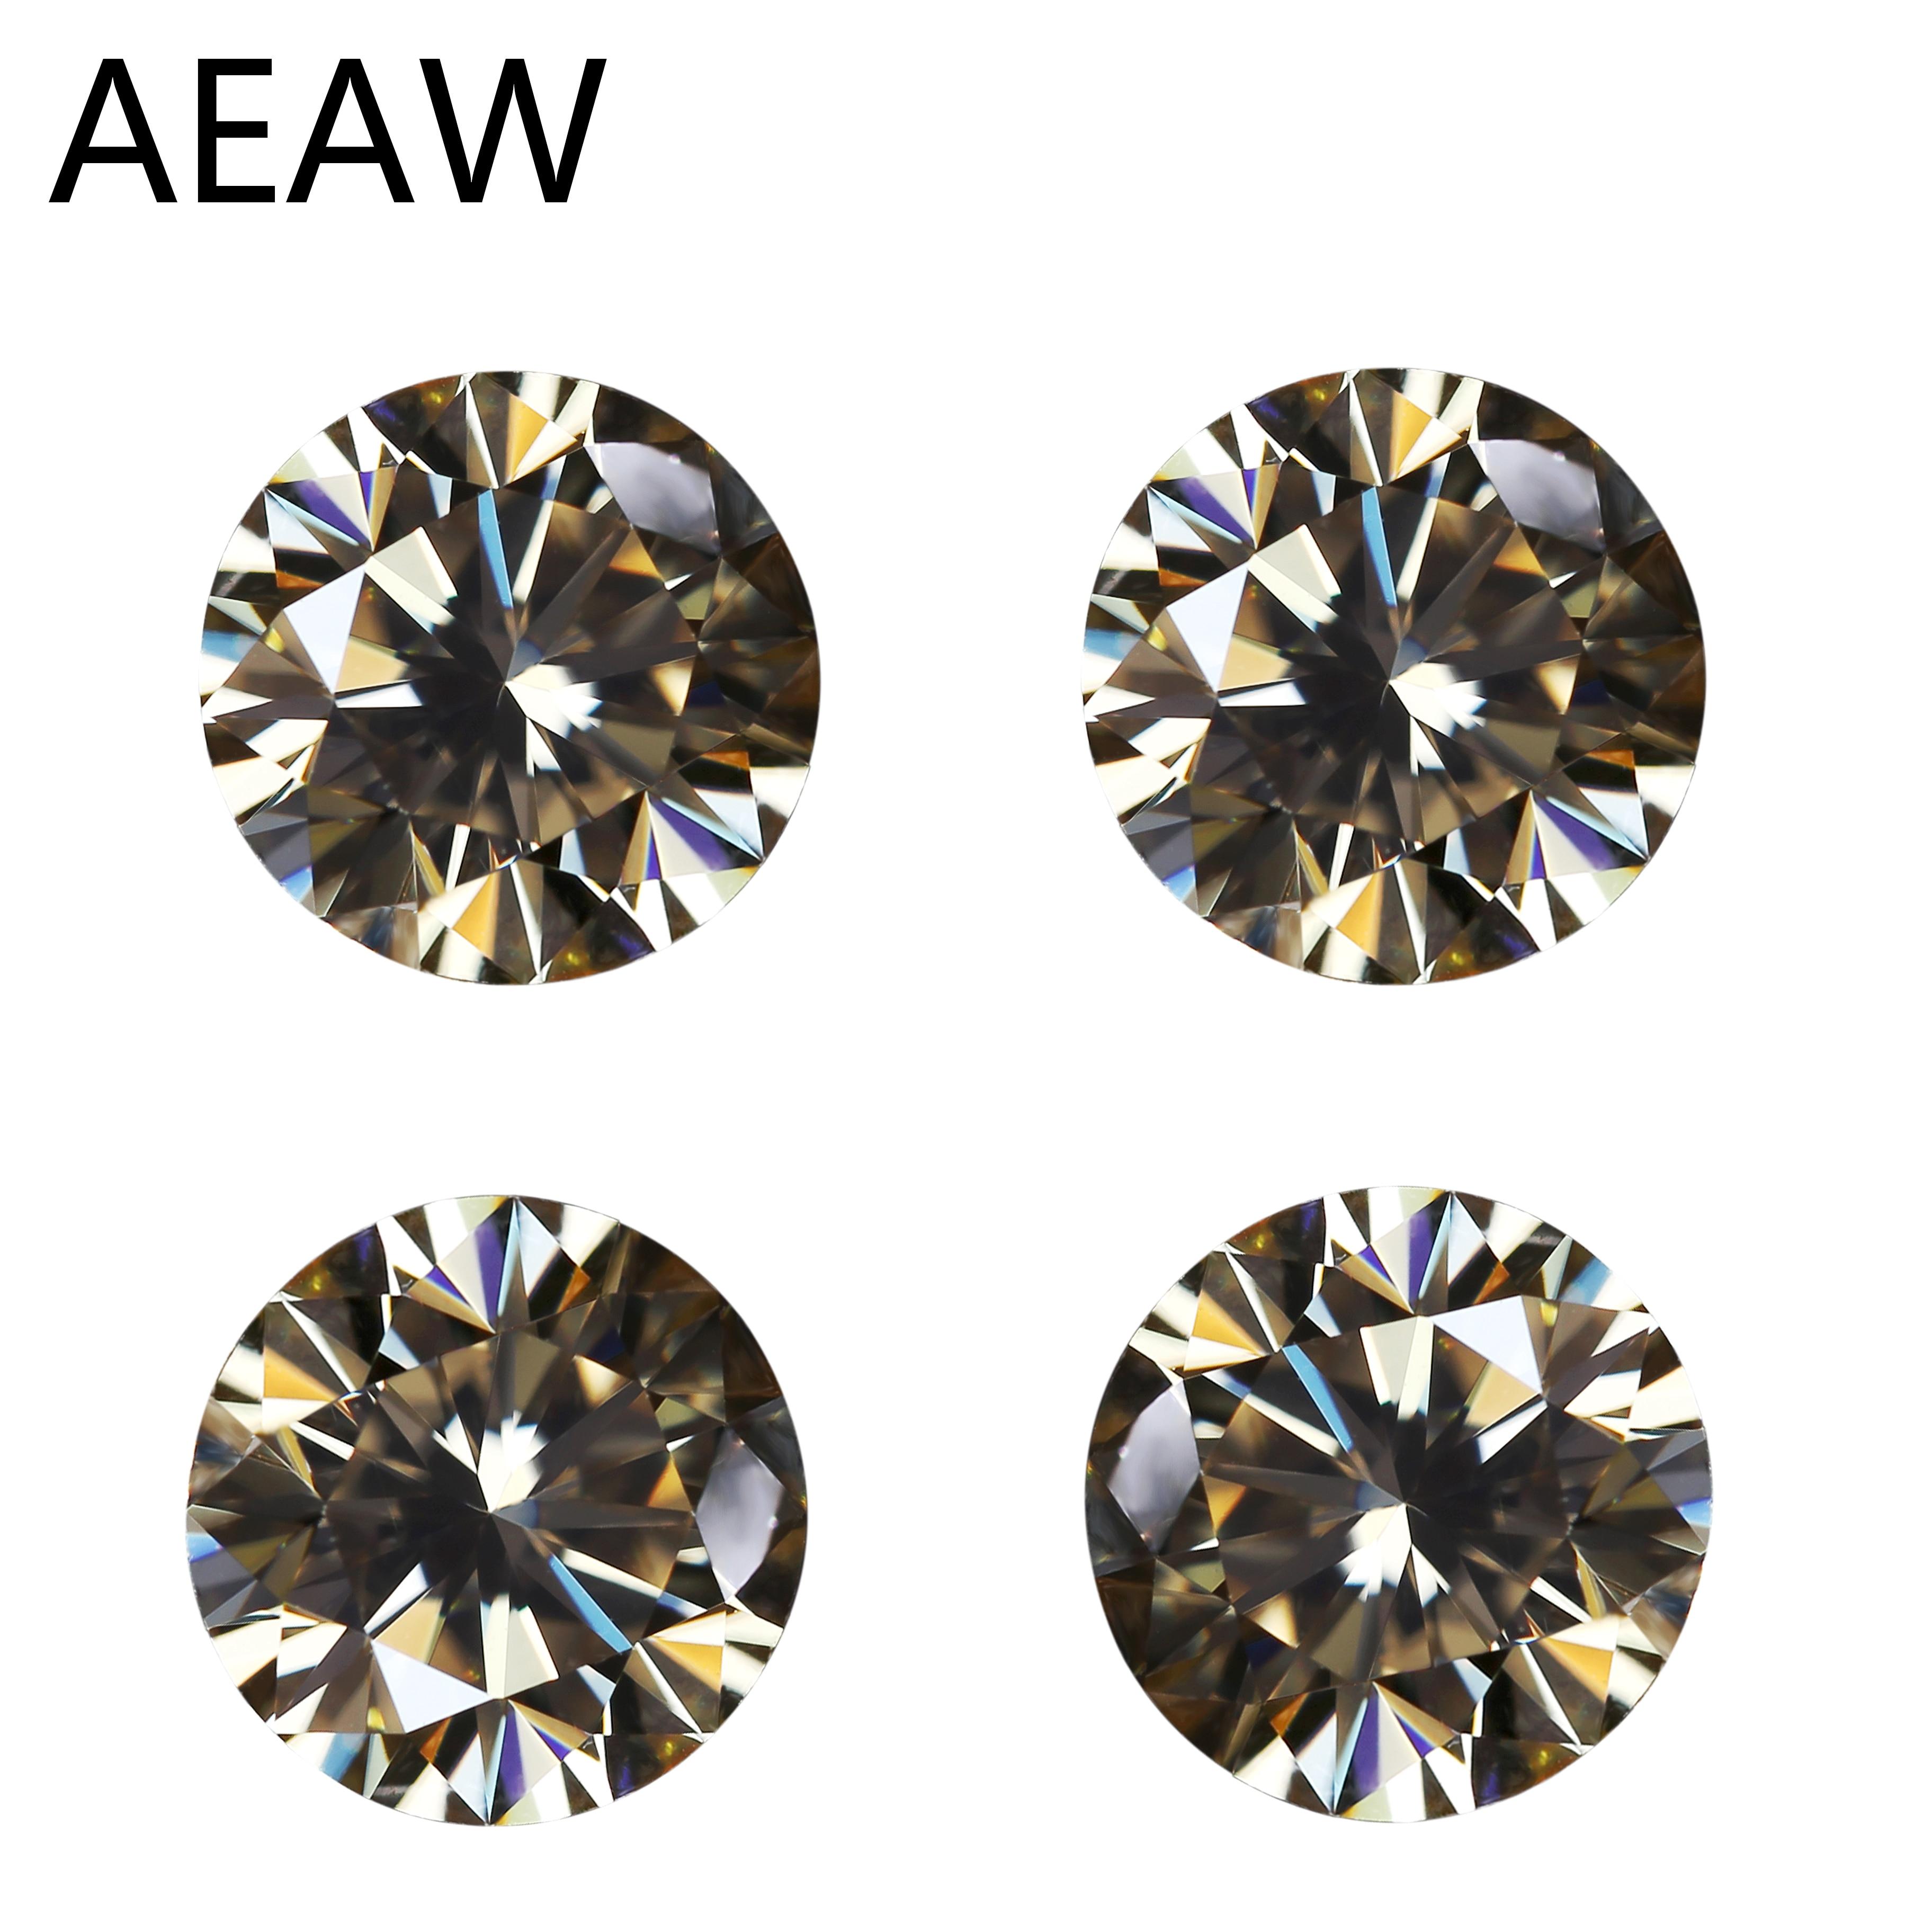 5mm 0.46ct Carat VVS1 Excellent Cut Grade Test Positive Round Cut Yellow Moissanite EF Color Loose Stones Moissanite